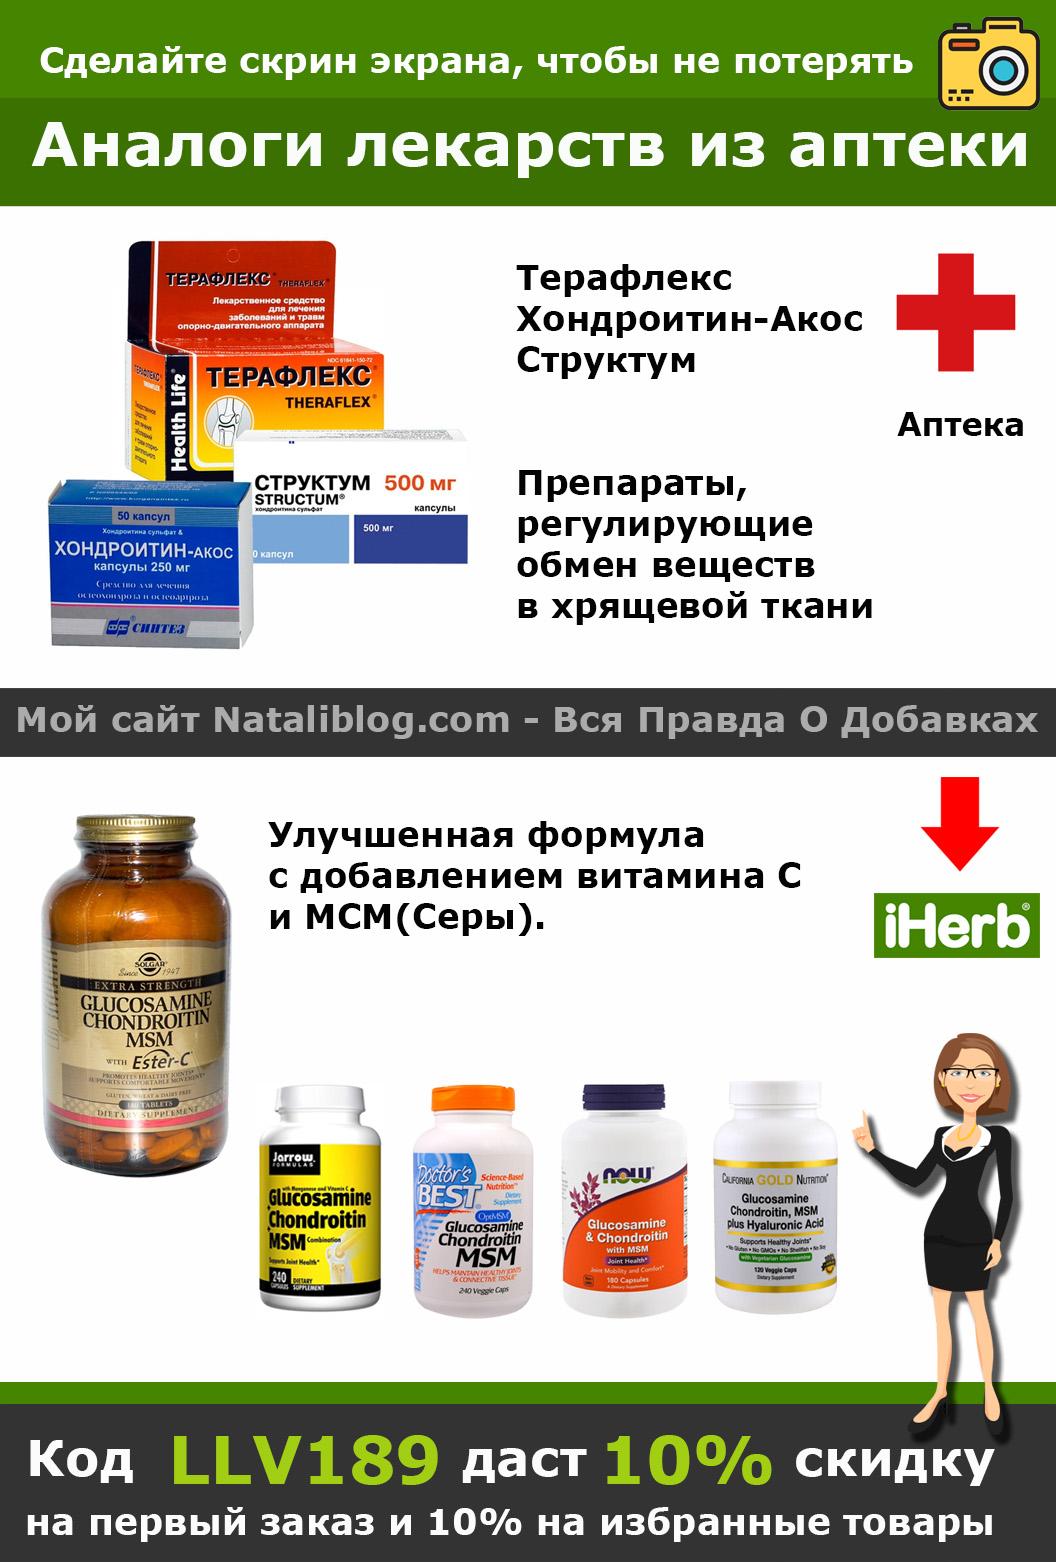 Vitrum Condroitin Glucosamina)